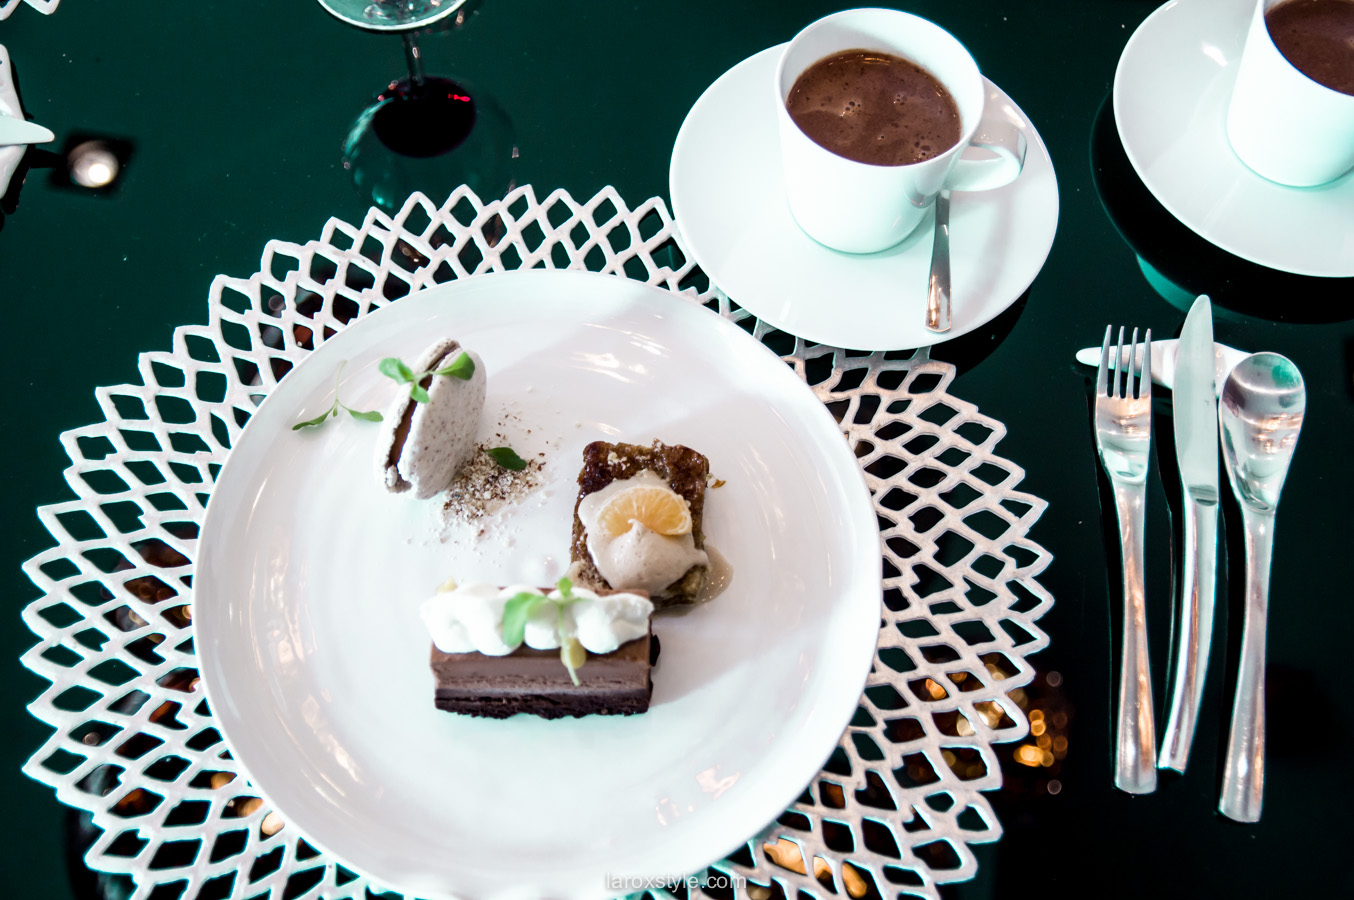 L'eclat restaurant Lyon - dessert au chocolat - adresses food lyon